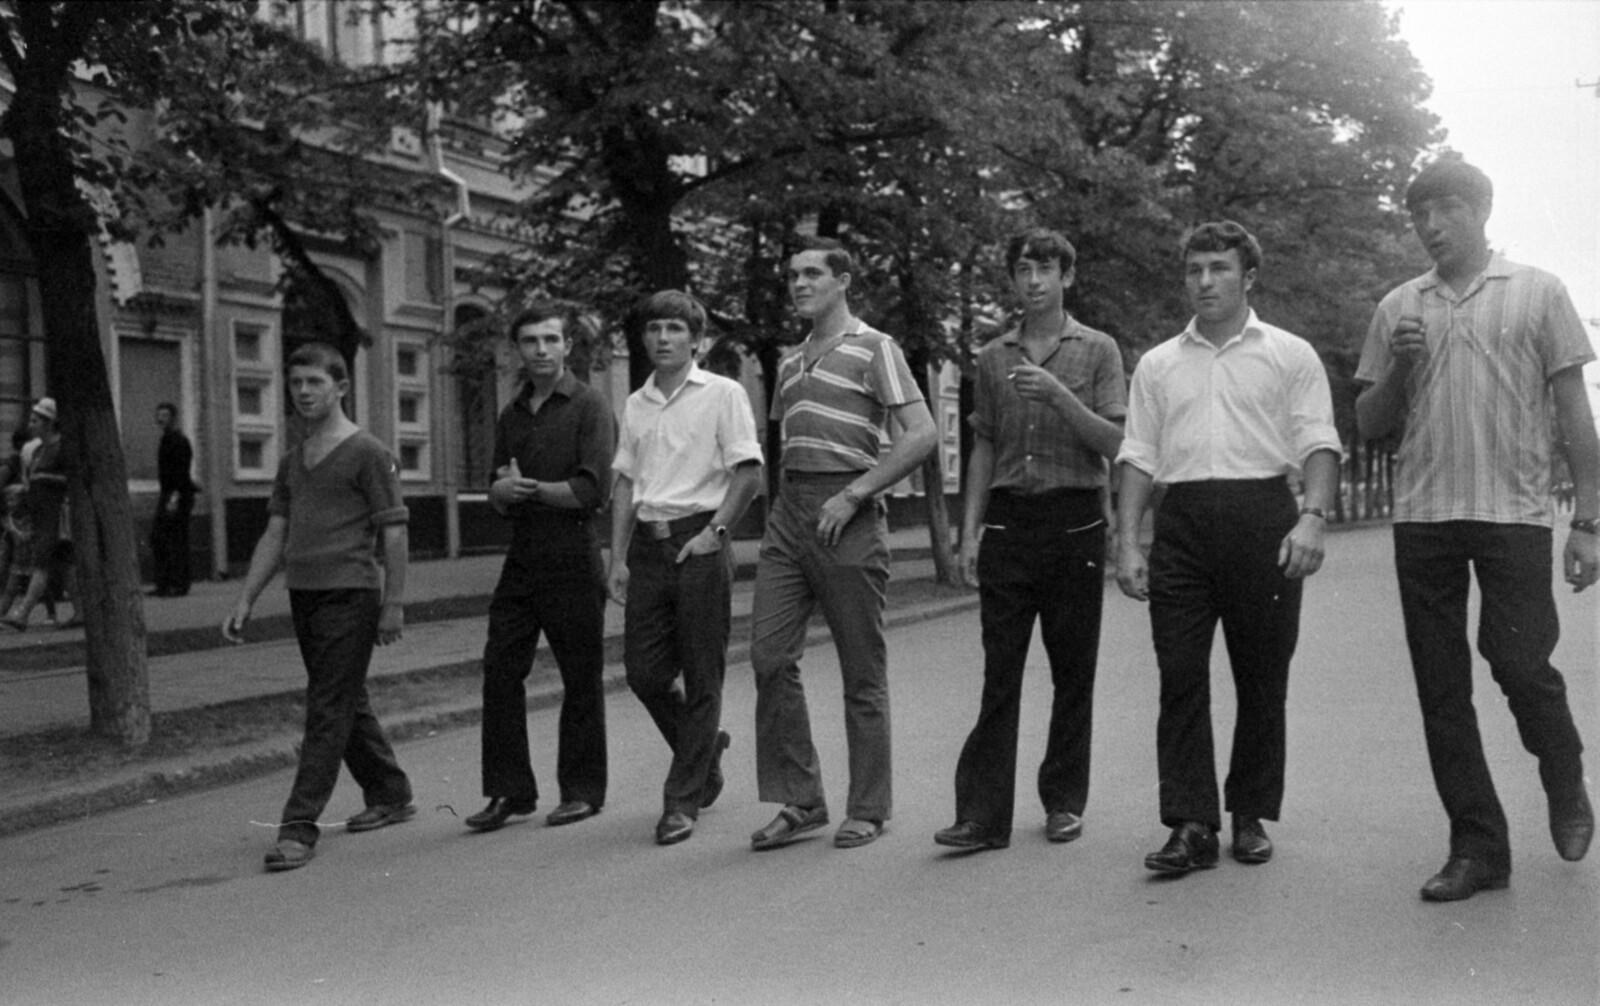 1968. Кировоград. Улица Ленина, дом 7